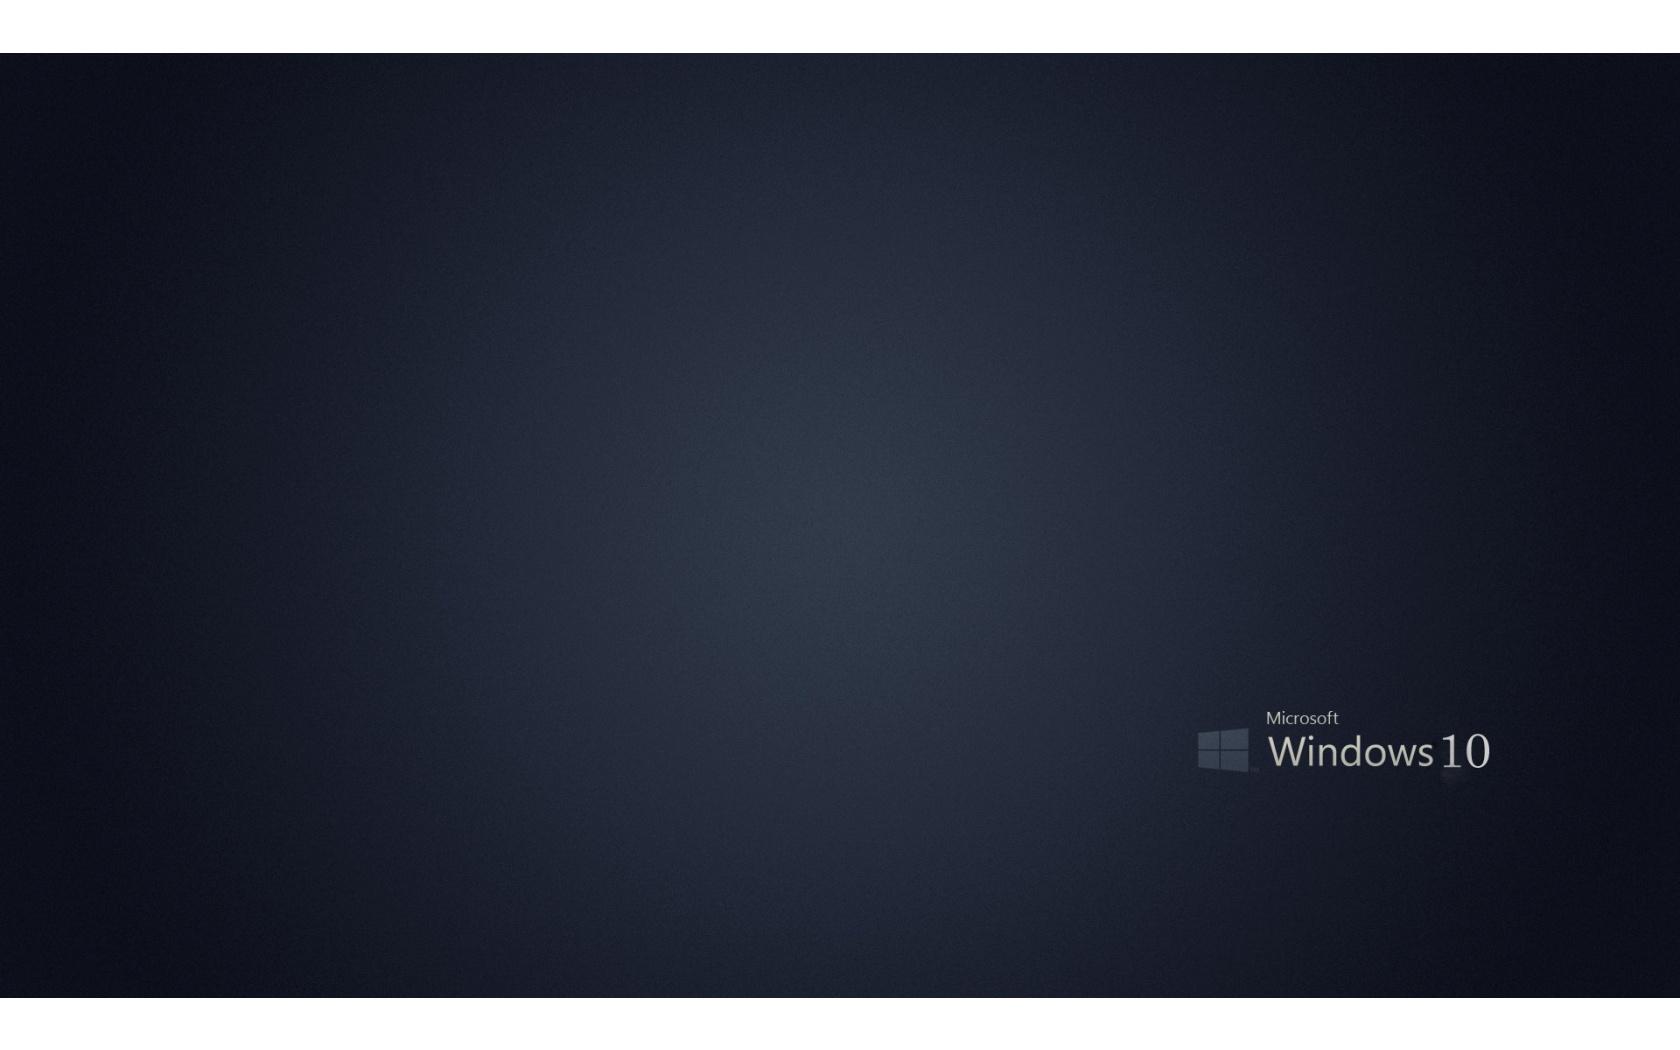 ... sub categories windows 10 tags windows ten windows 10 gray grey